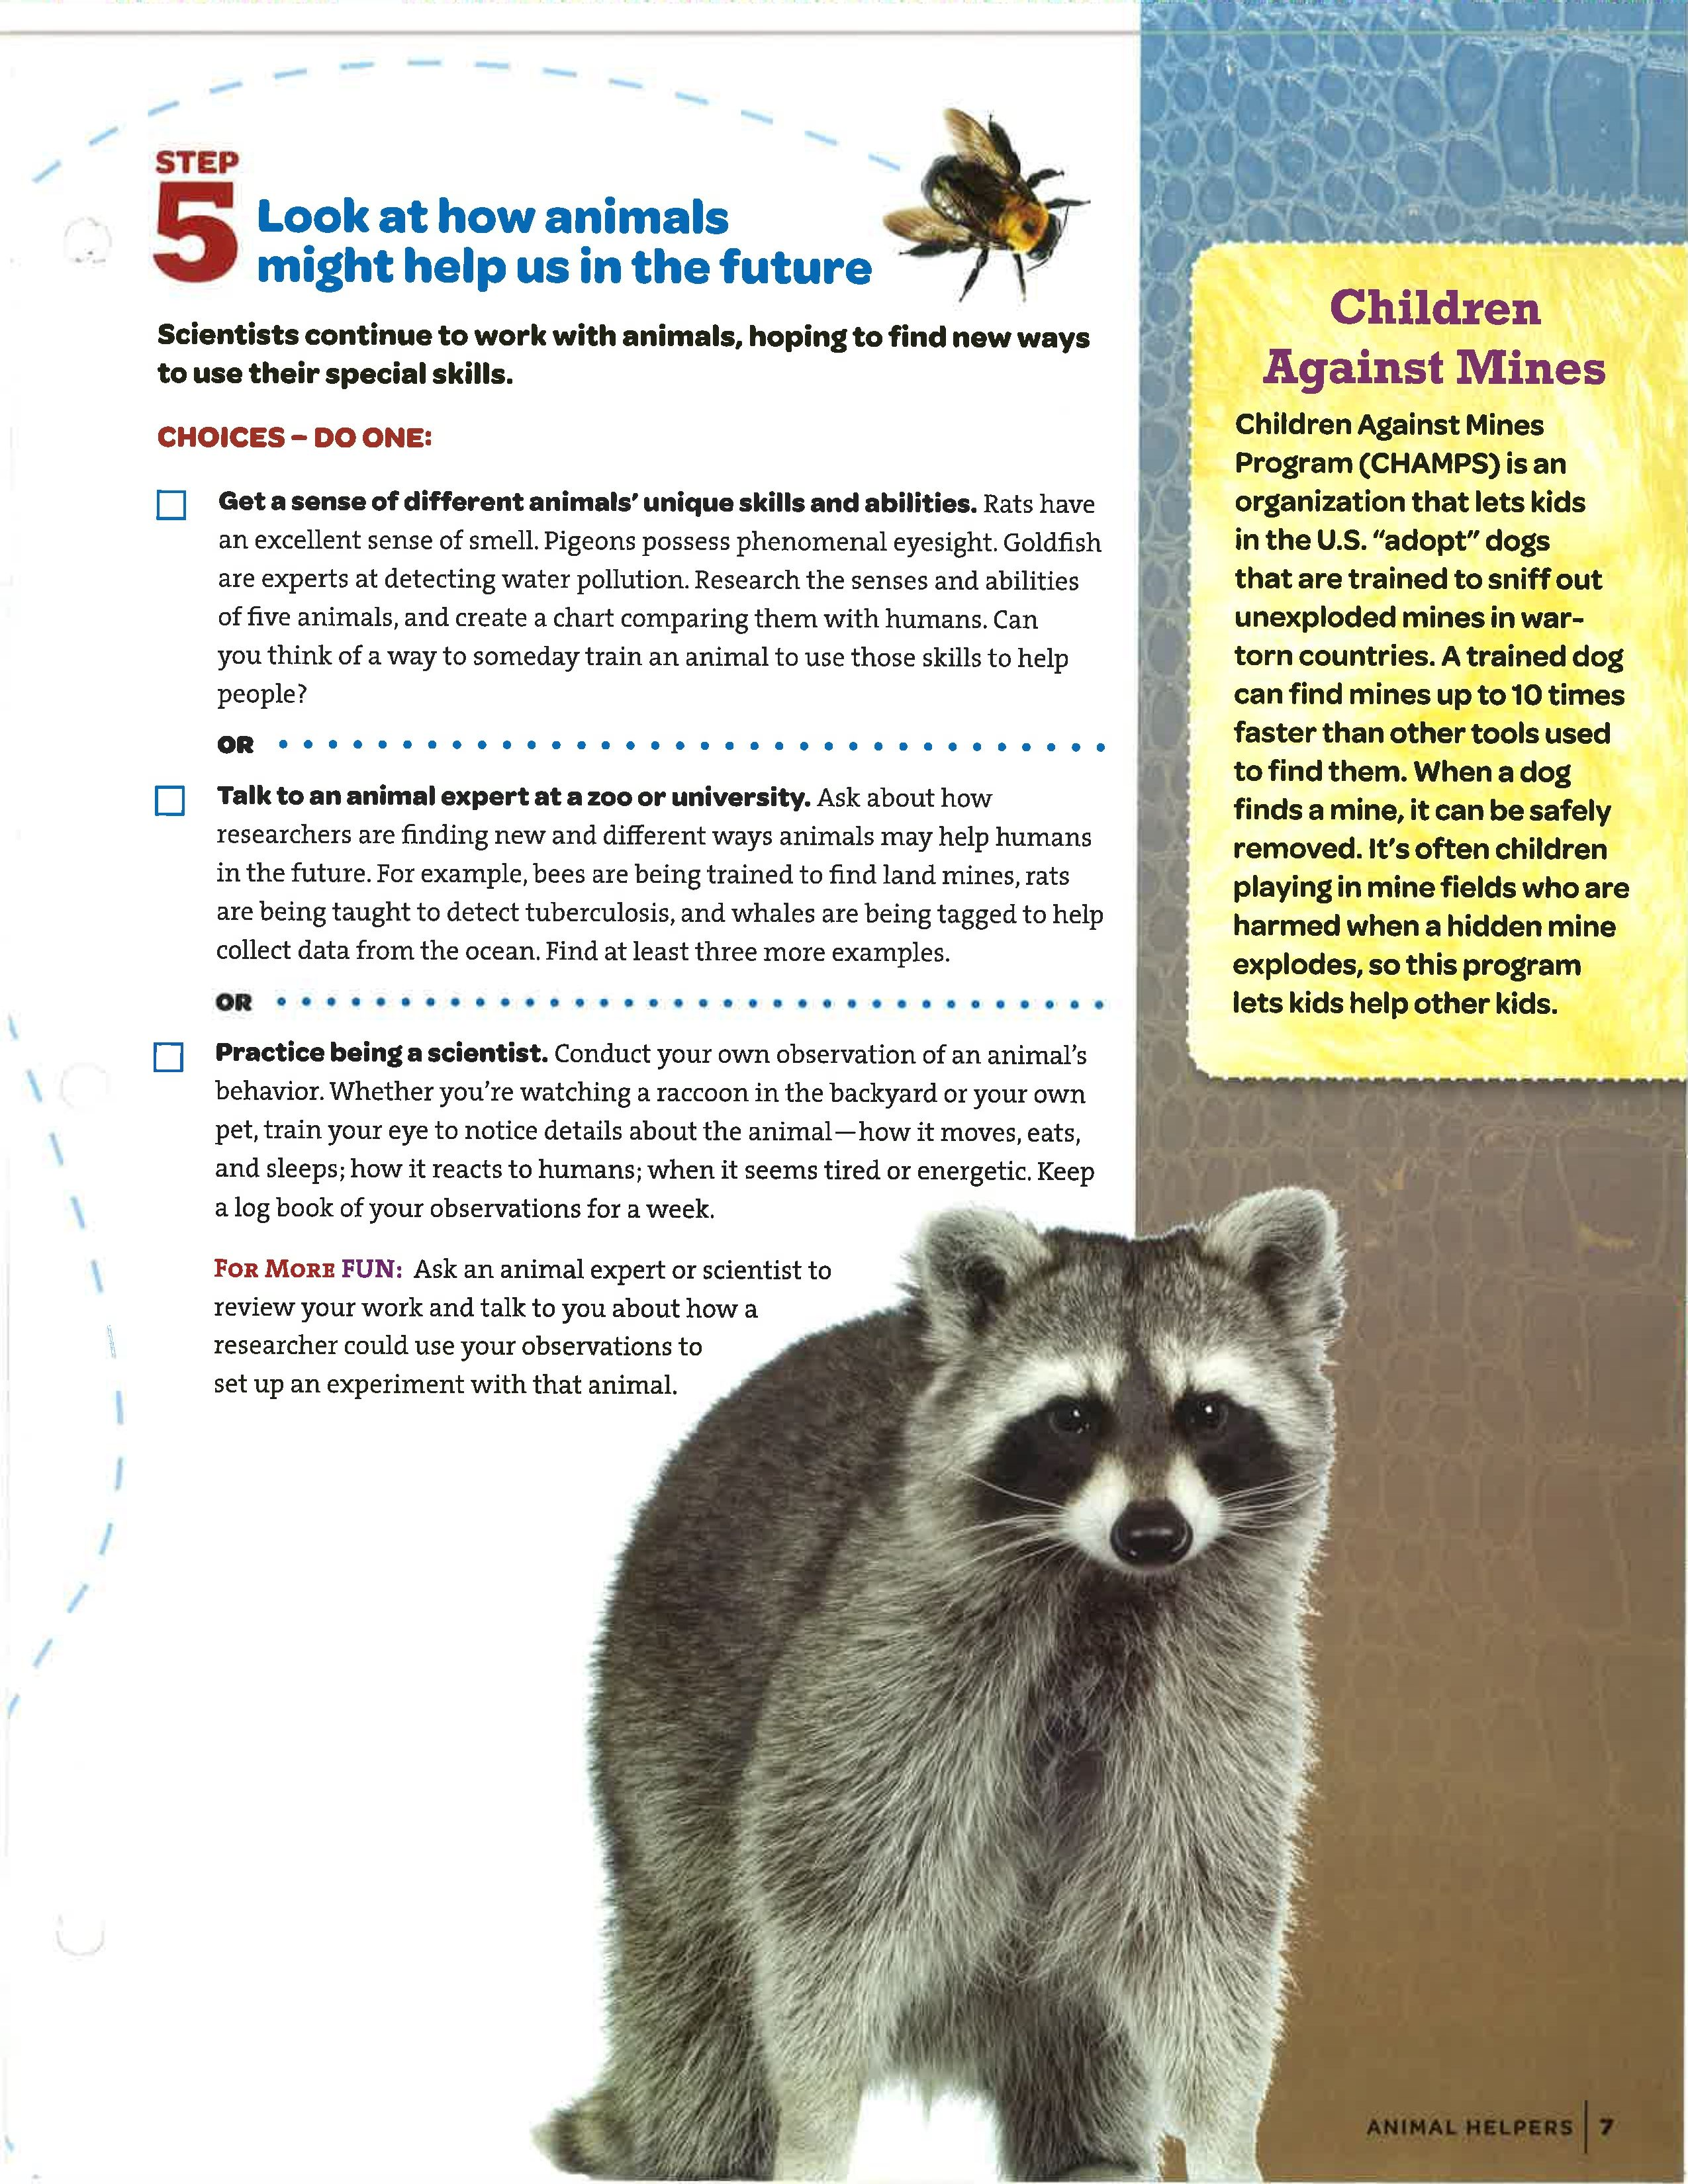 step 5 cadette media animal helpers badge pinterest